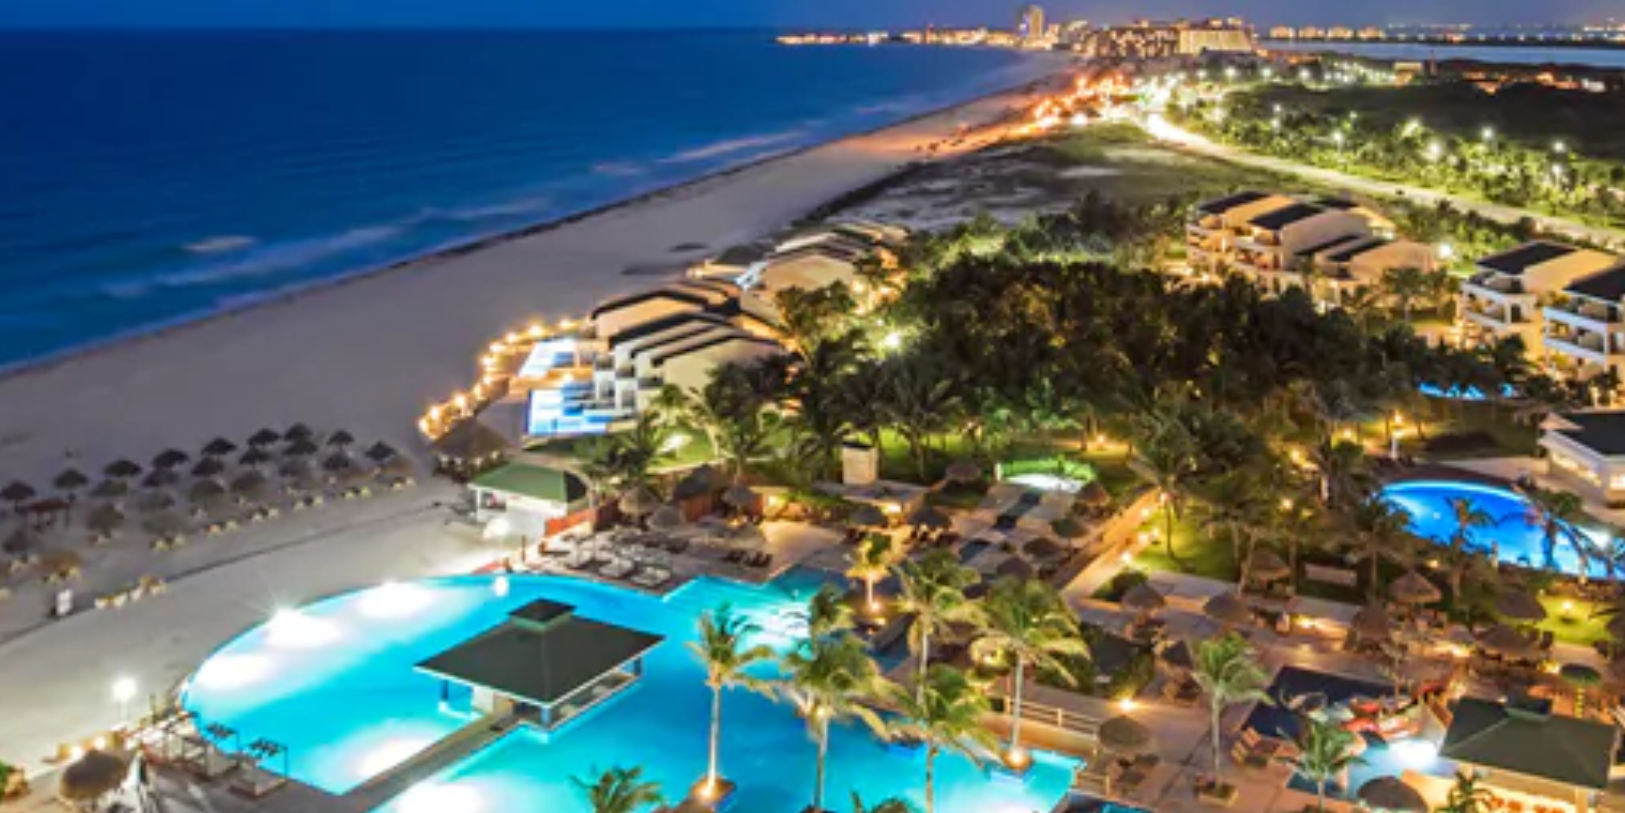 Vacations  All Inclusive Vacations Deals  Vacation deals